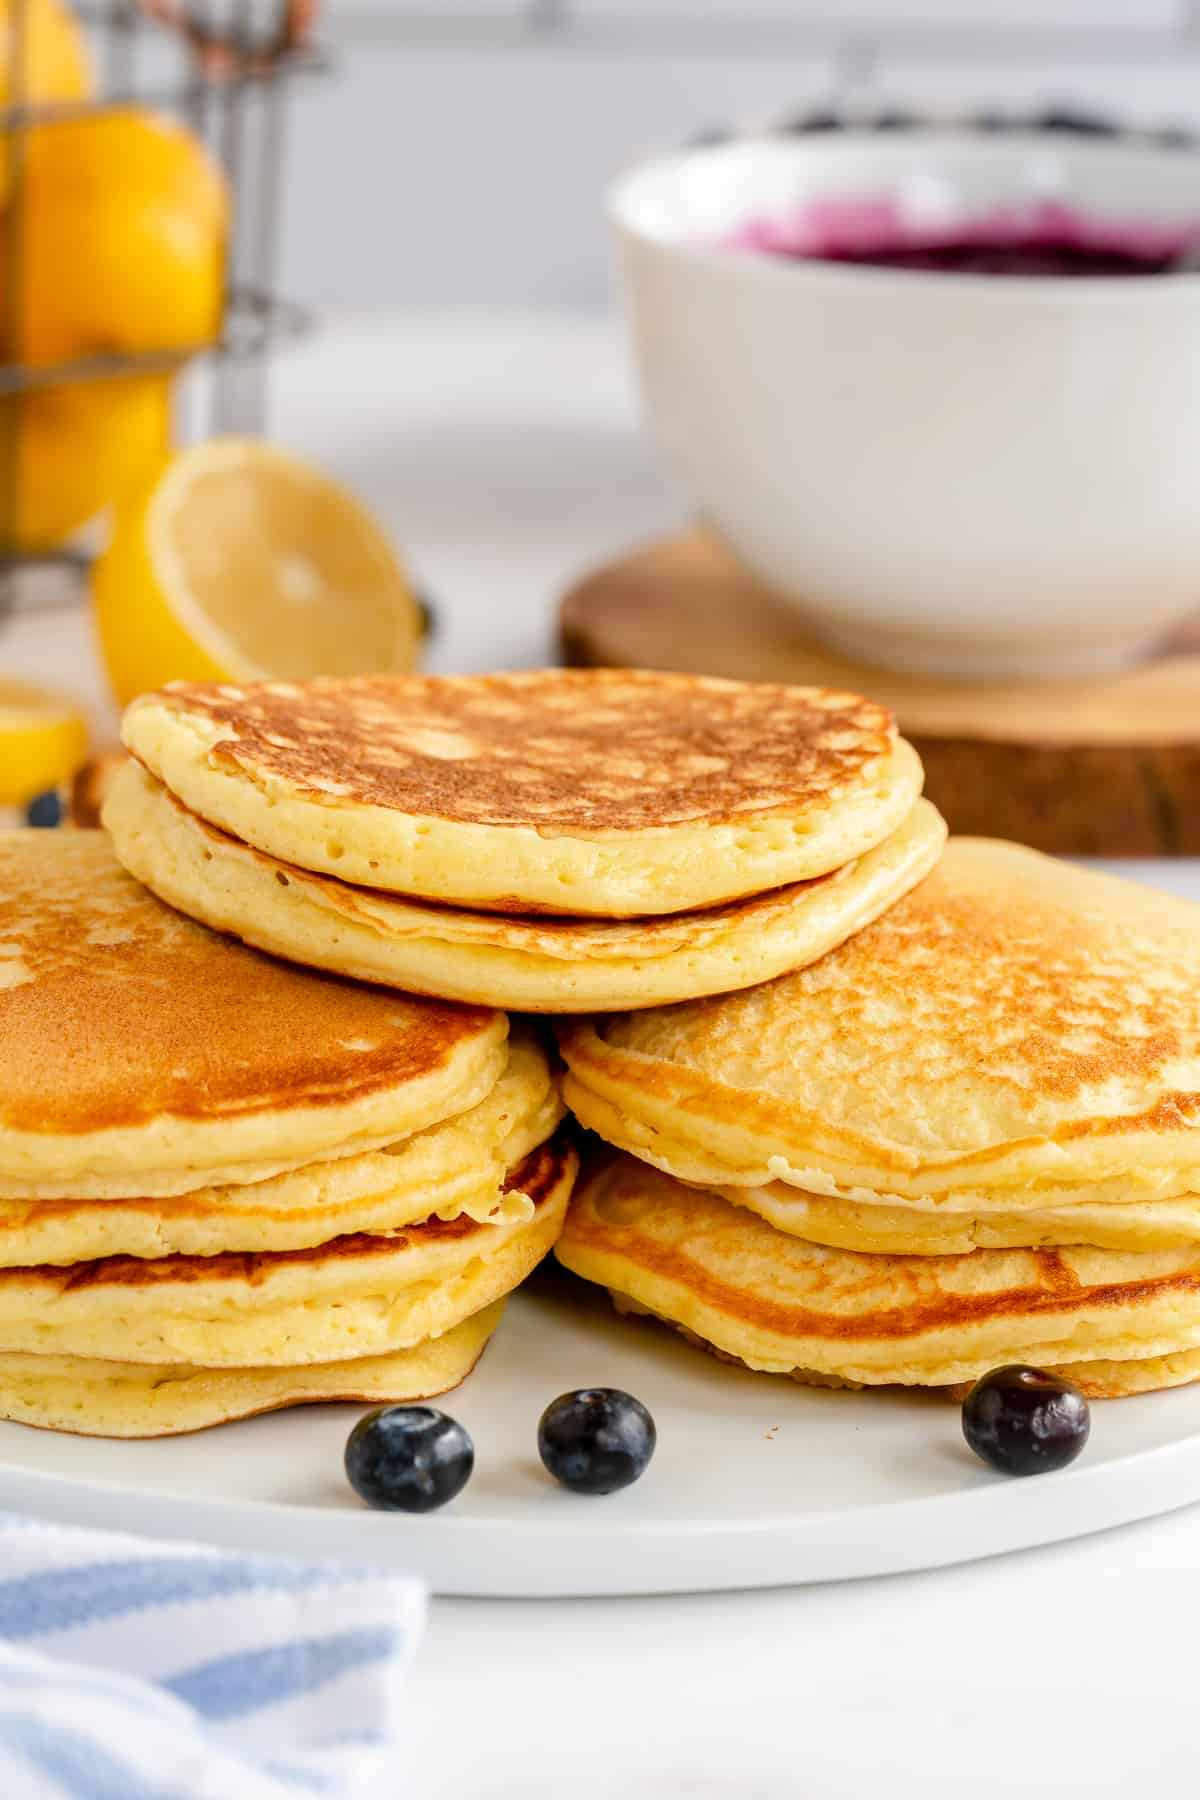 A close up of stacks of Lemon Ricotta Pancakes on a platter.